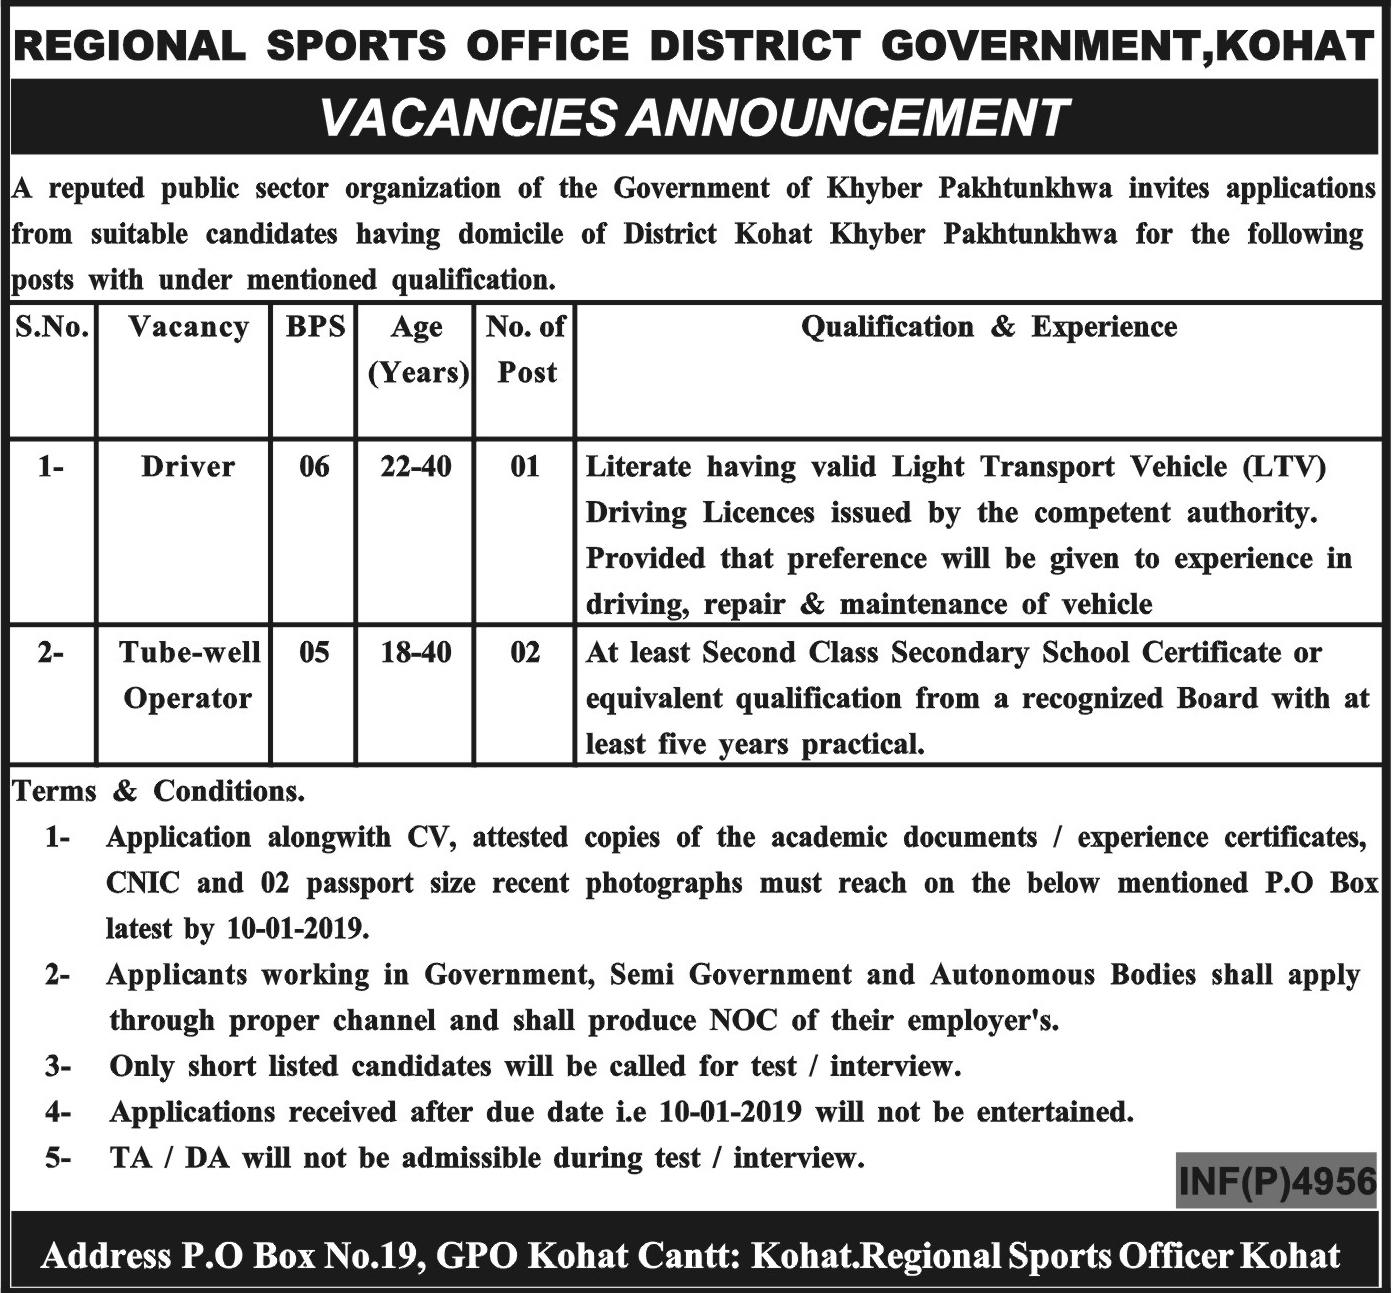 Regional Sports Office District Govt Kohat 29 Dec 2018 Jobs